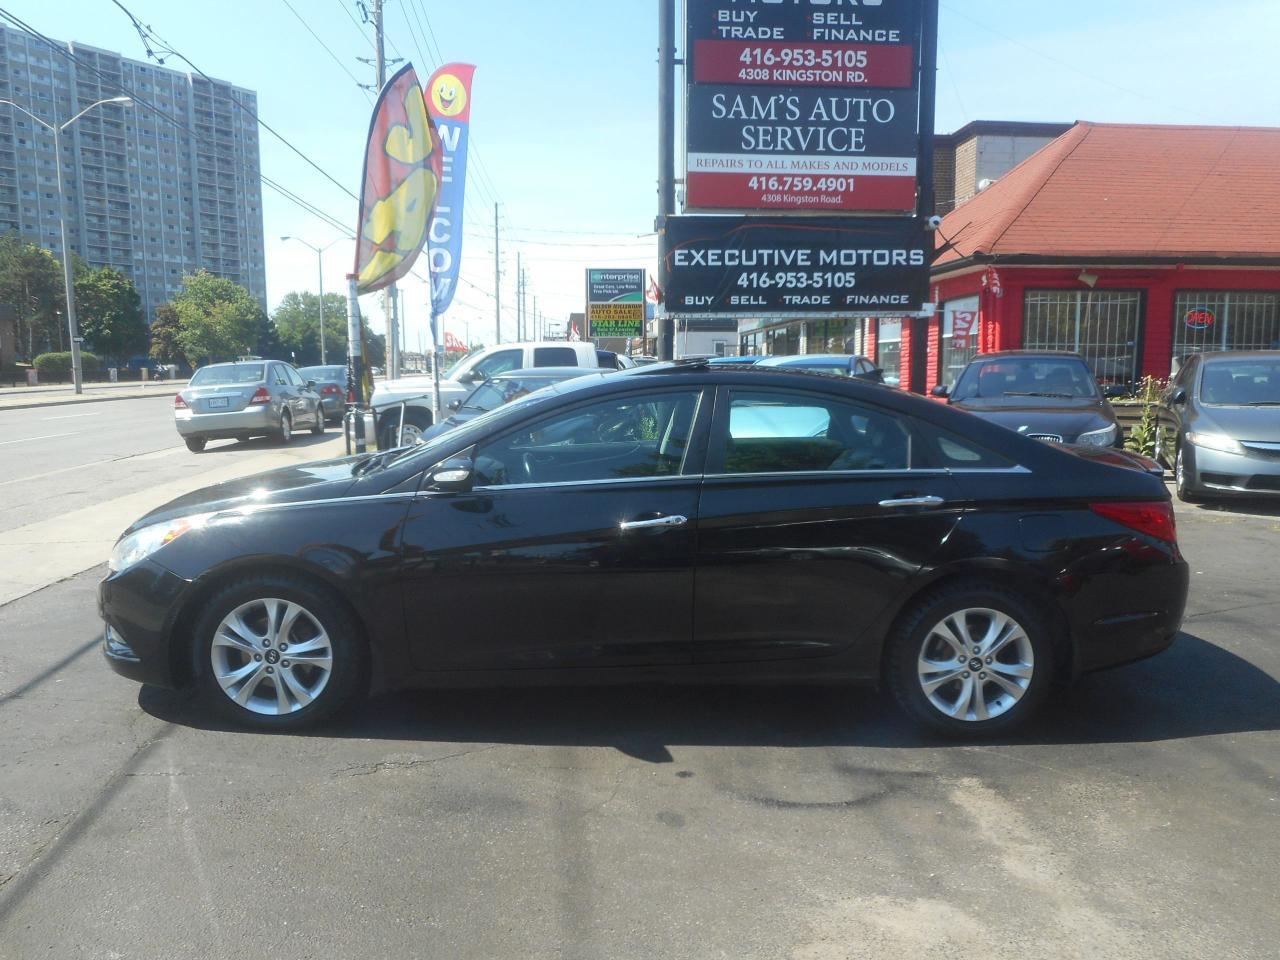 2011 Hyundai Sonata NAVIGATION / LEATHER / SUNROOF / PUSH START/ CLEAN